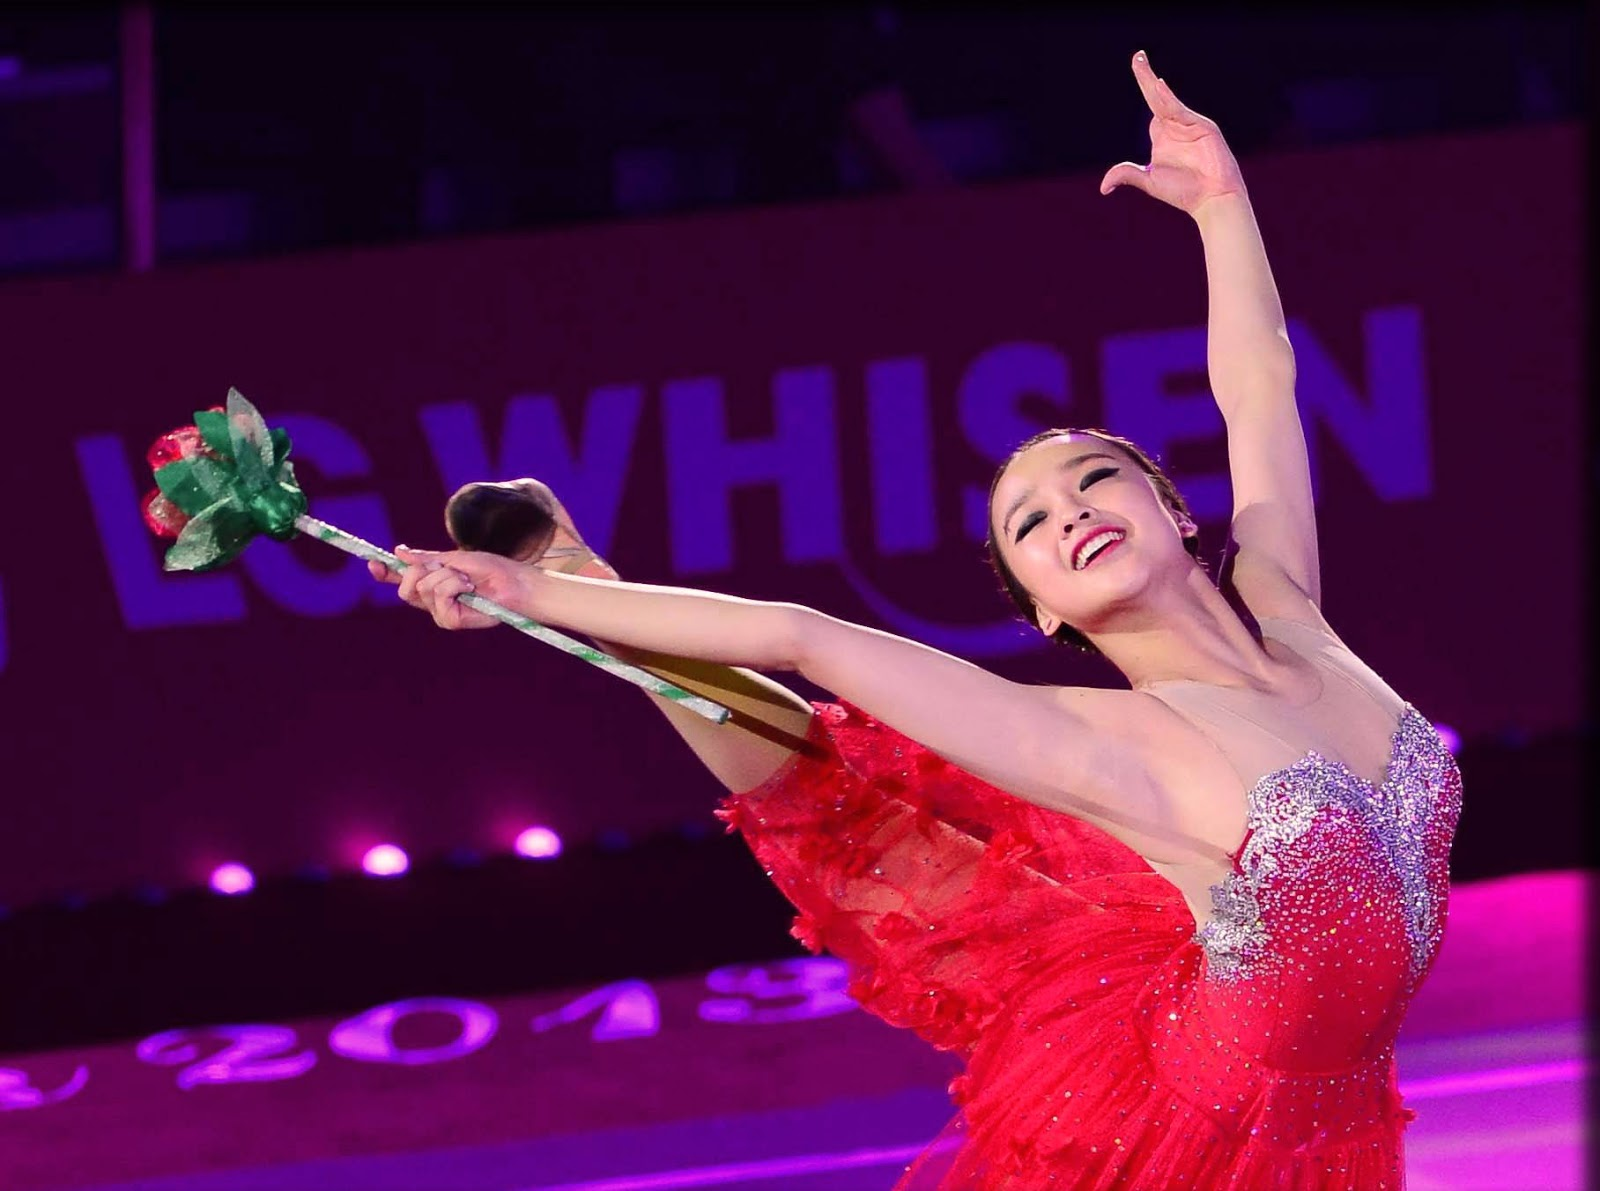 Son Yeon Jae Announces Her Retirement From Rhythmic Gymnastics